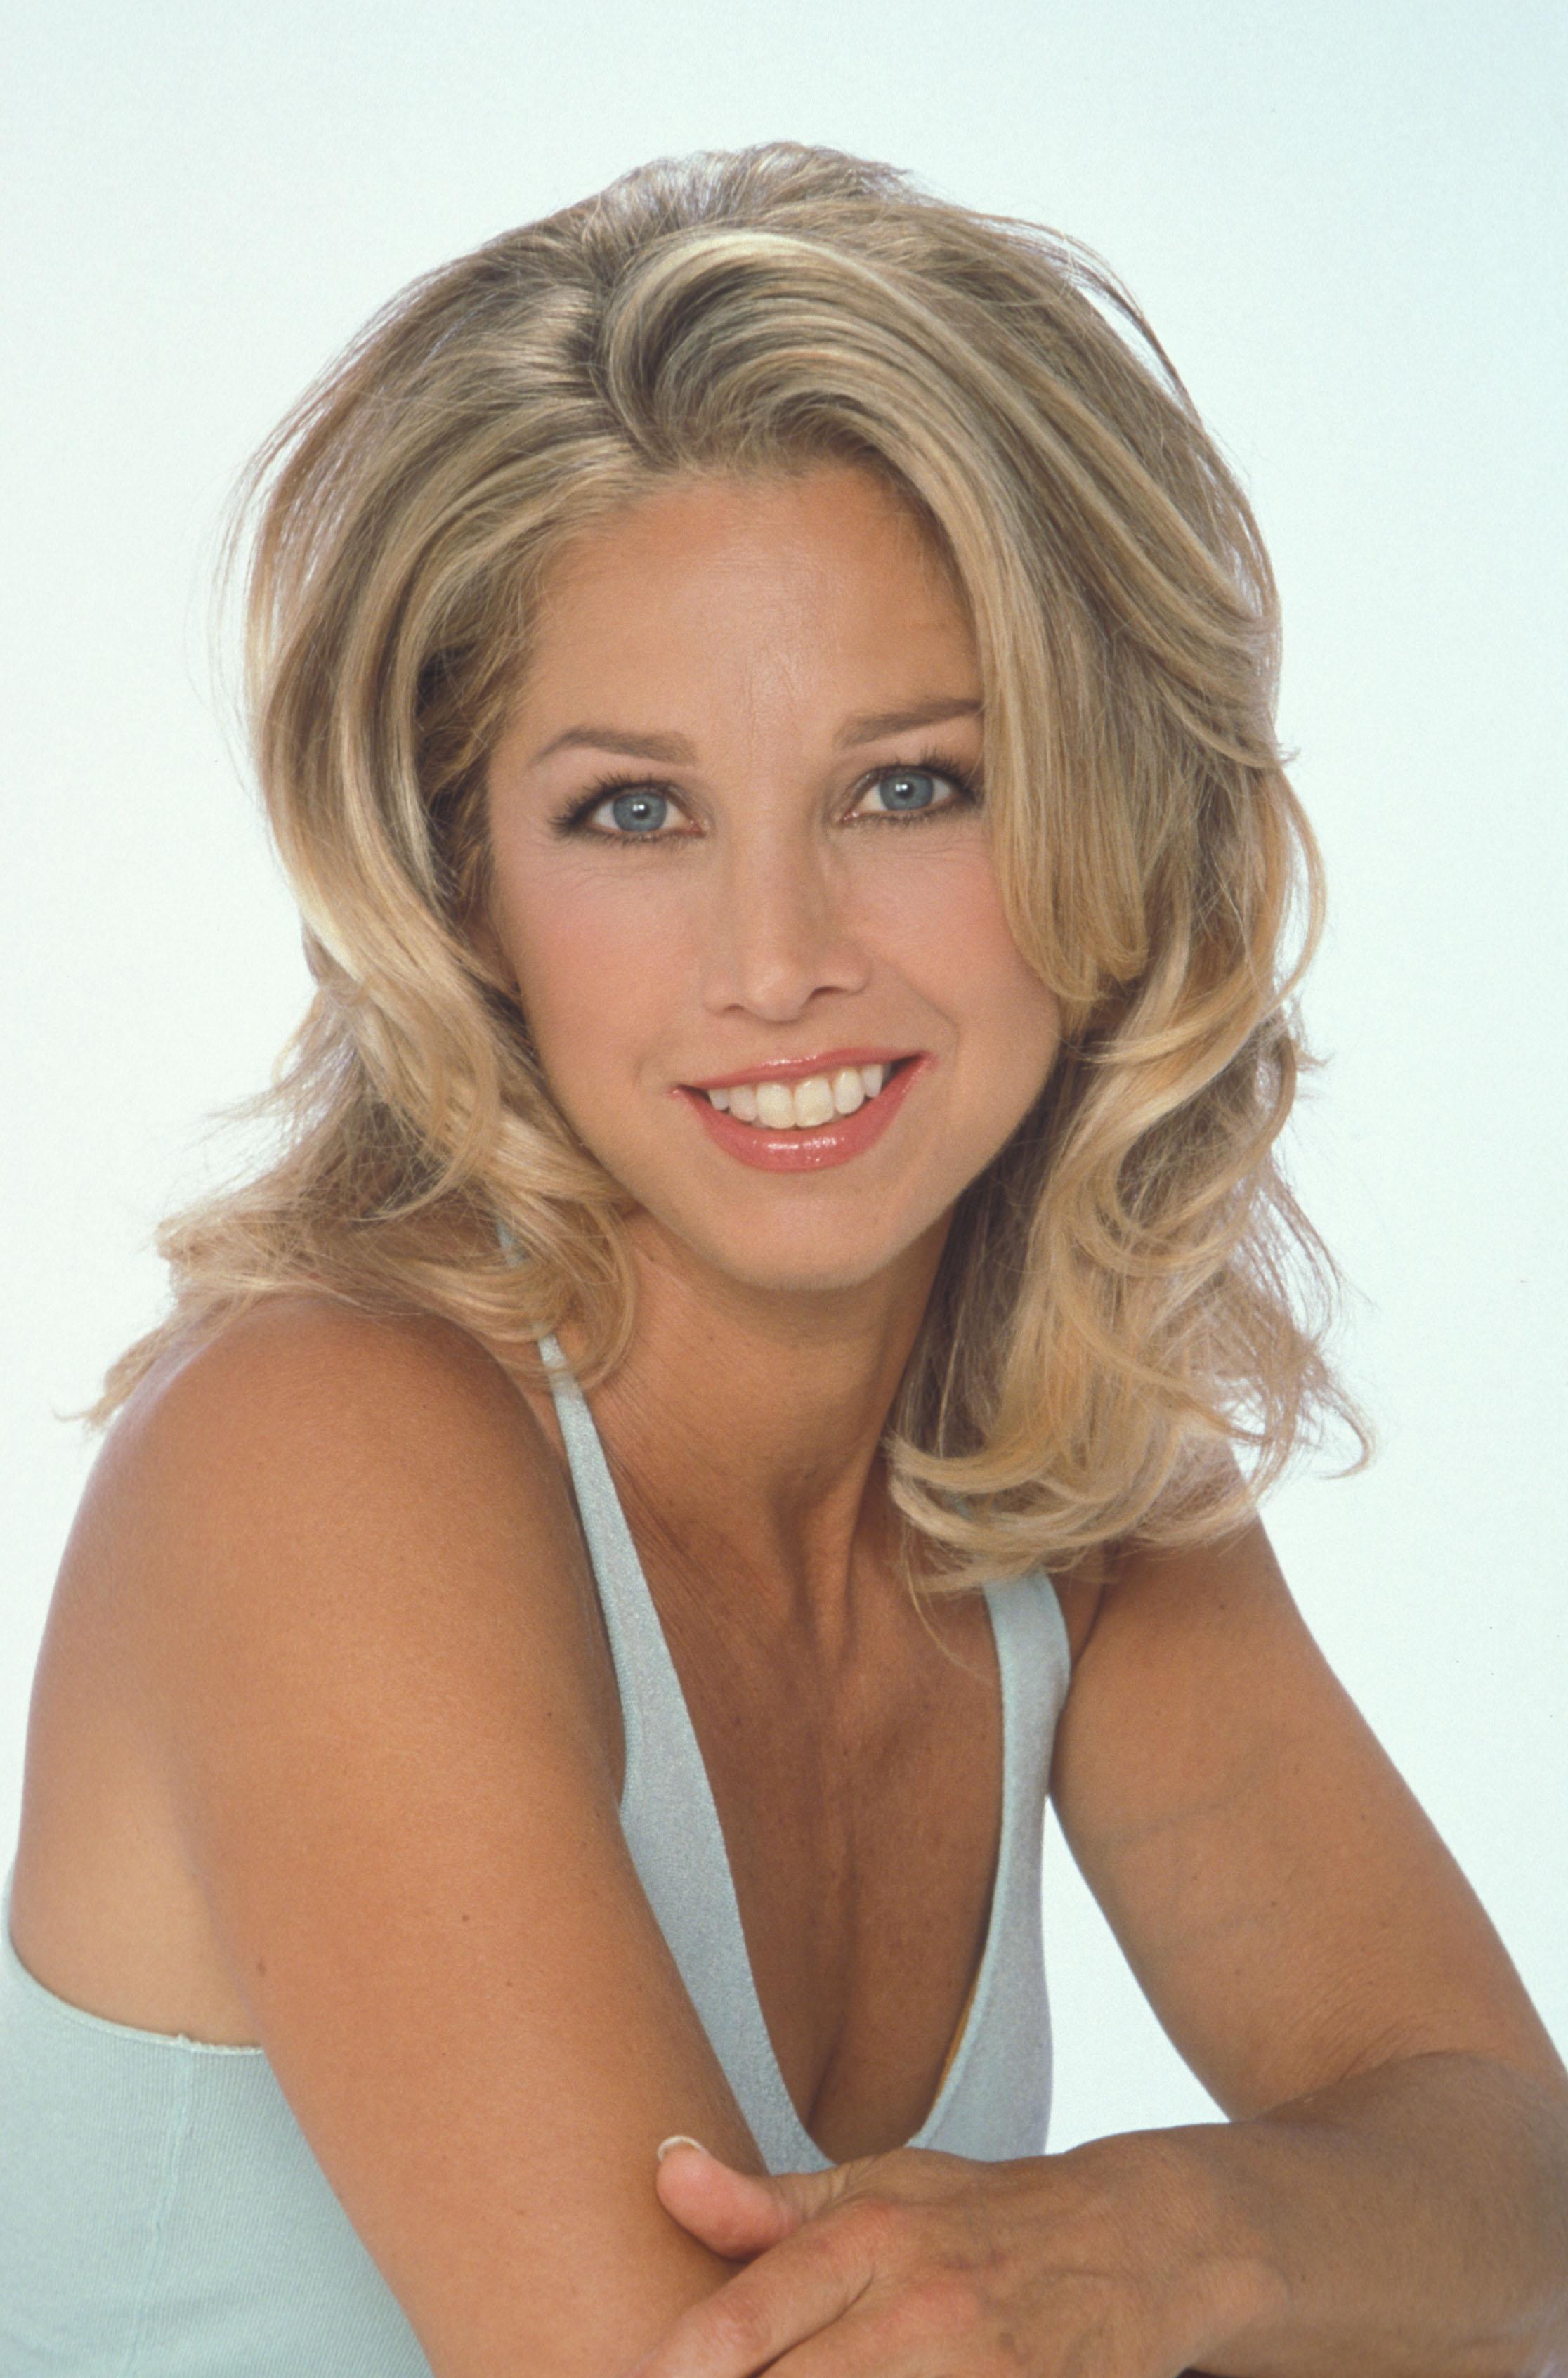 Denise Austin CWB PS 2000 02